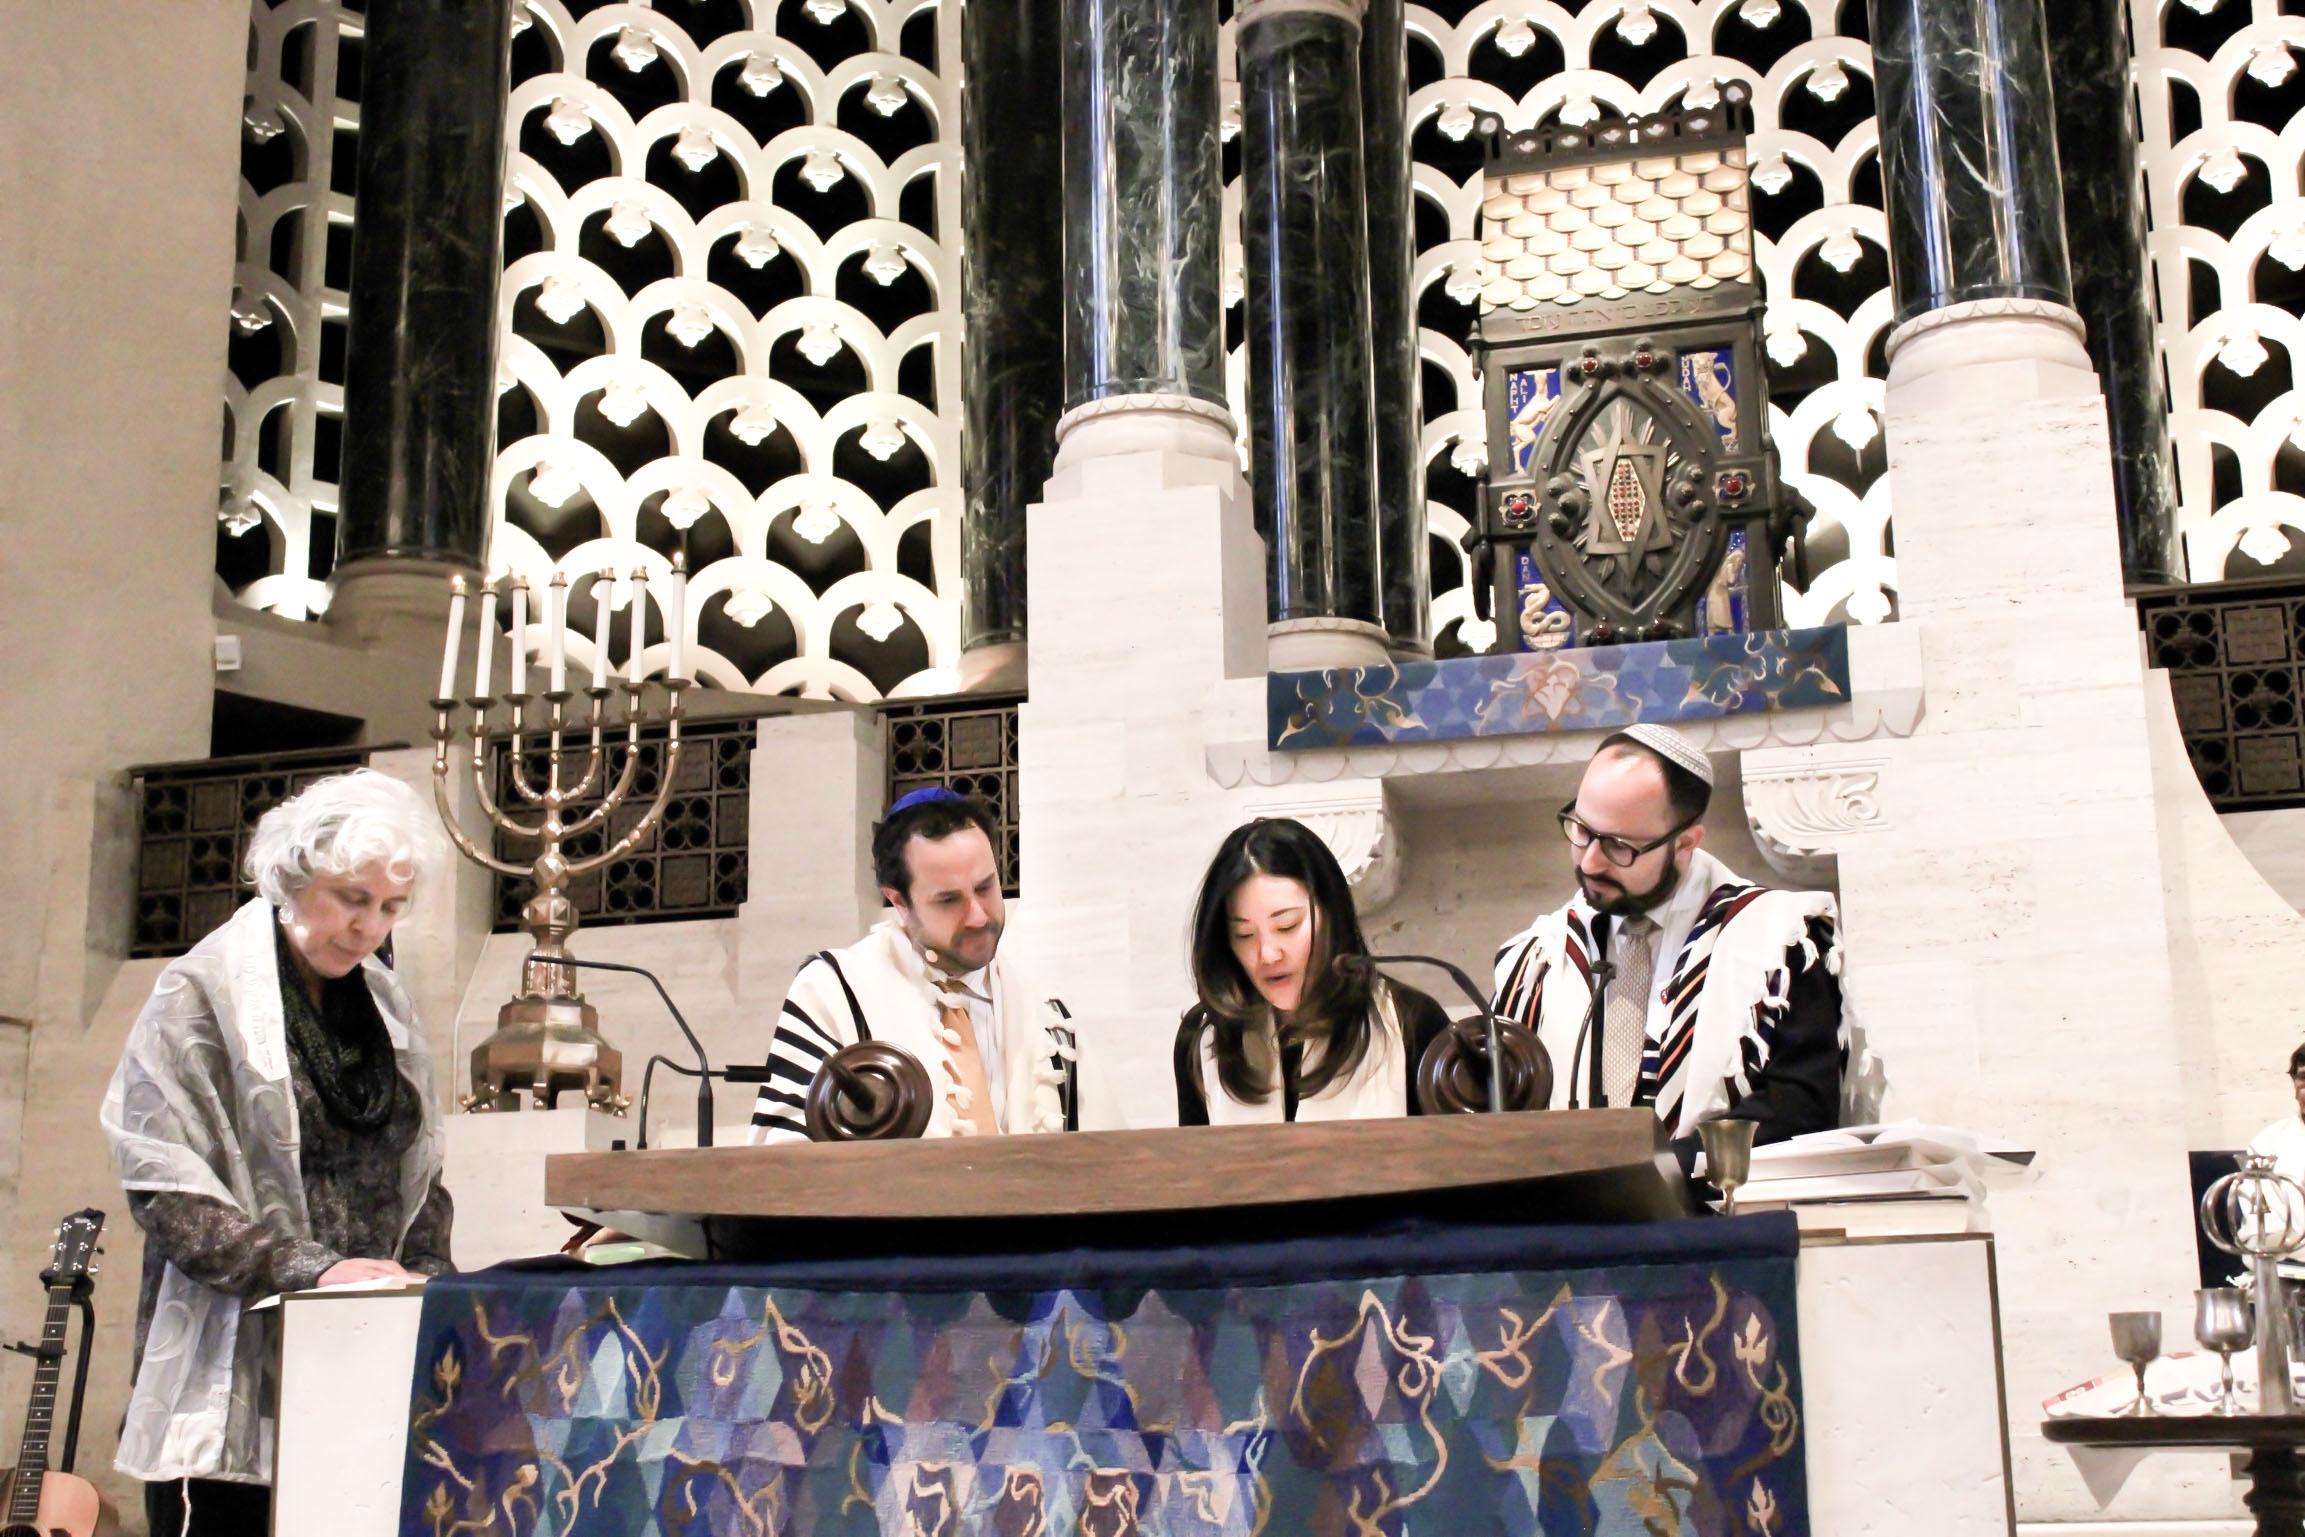 Reading Torah at my b'nei mitzvah service